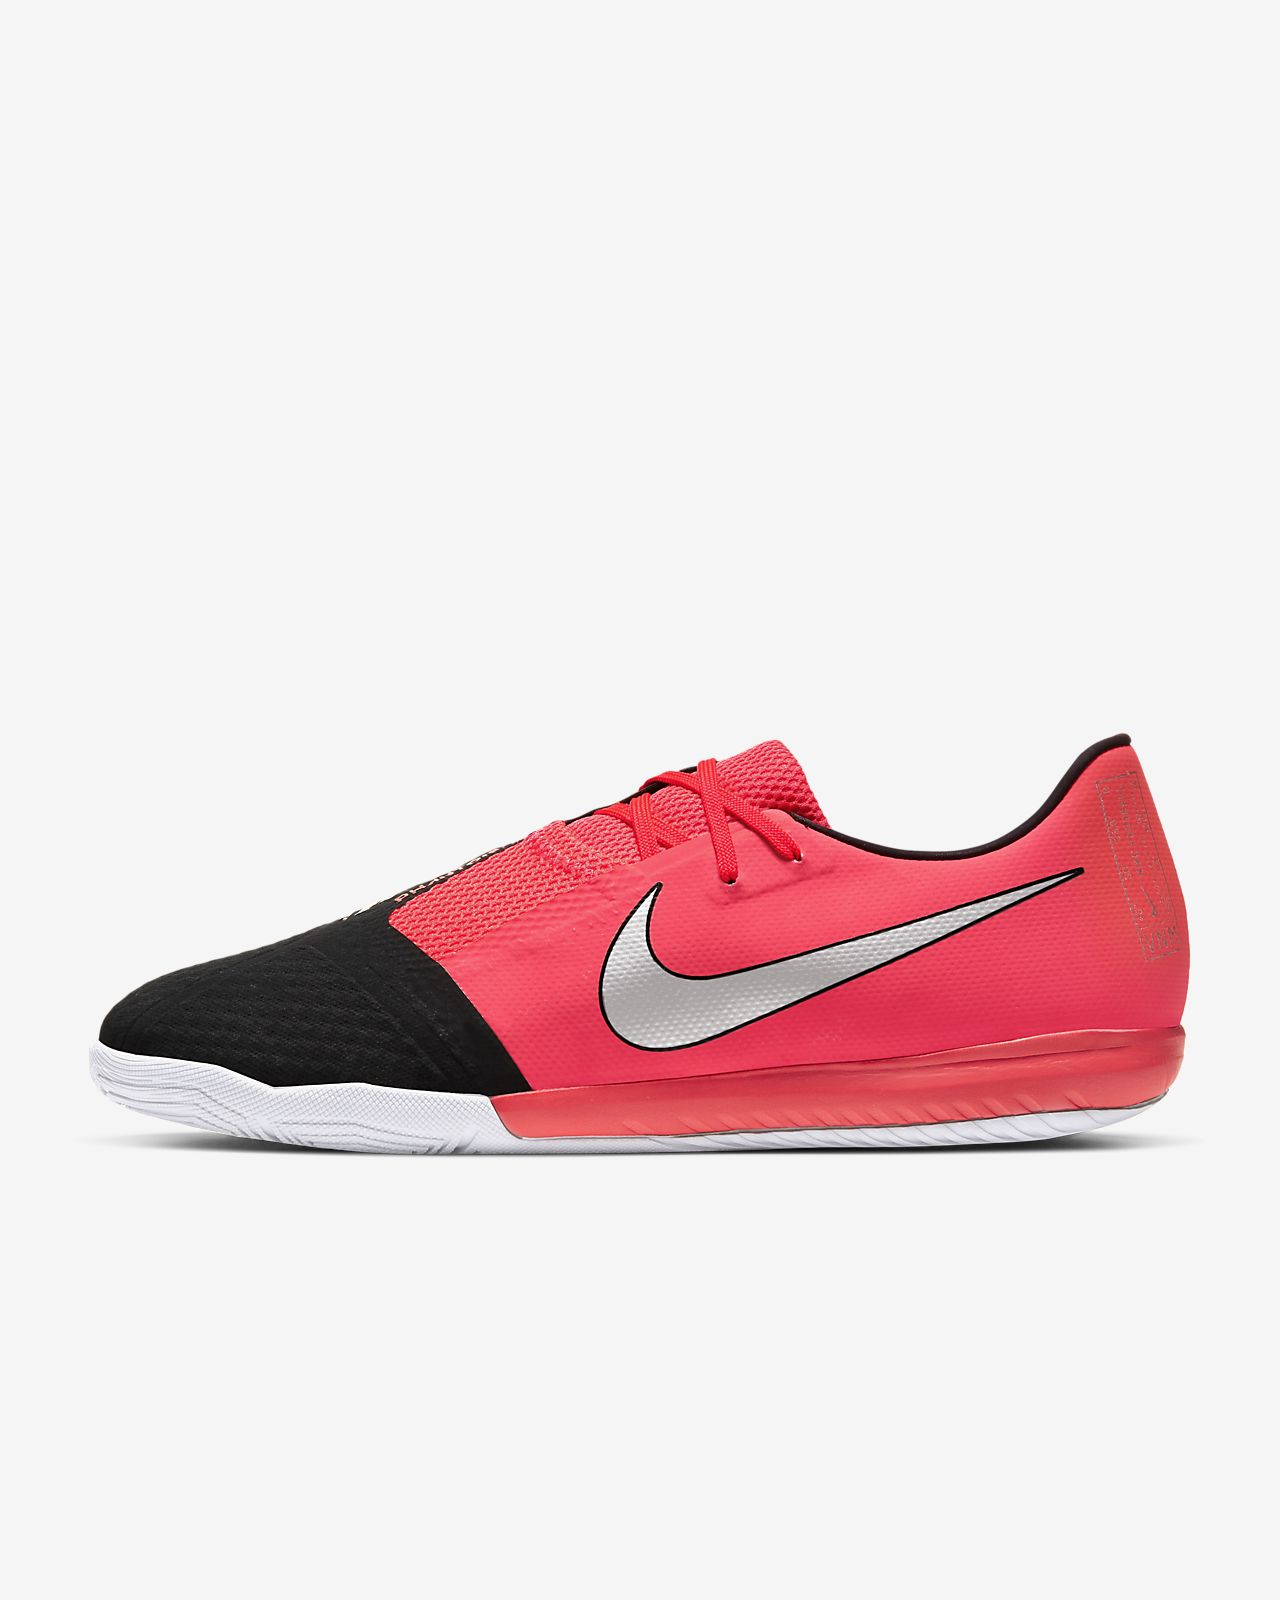 Indoorcourt Schuhe Nike JR PHANTOM VENOM ACADEMY IC rot